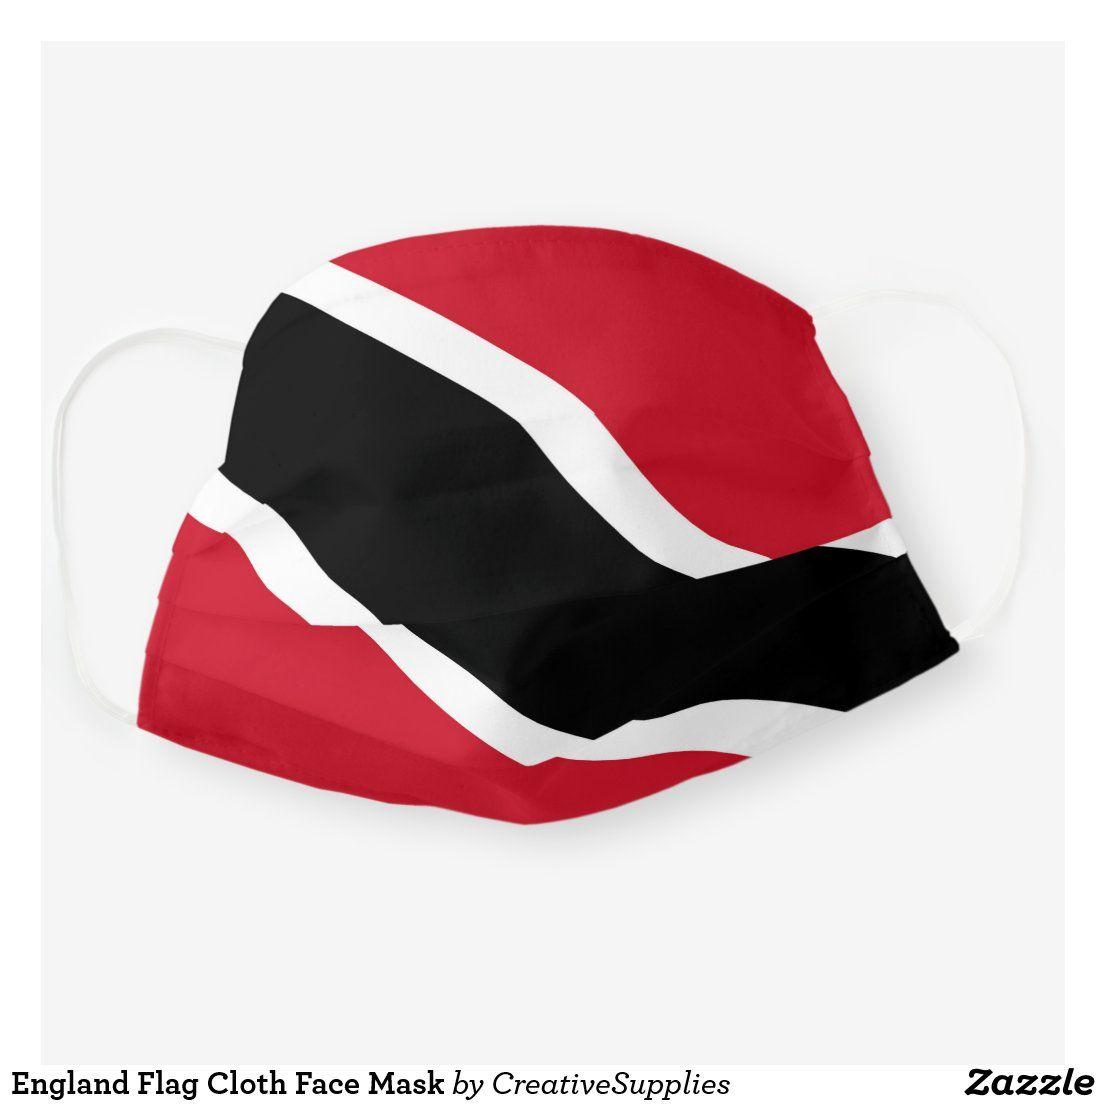 Trinidad Flag Cloth Face Mask Zazzle Com In 2020 Trinidad And Tobago Flag Tobago Flag Face Mask